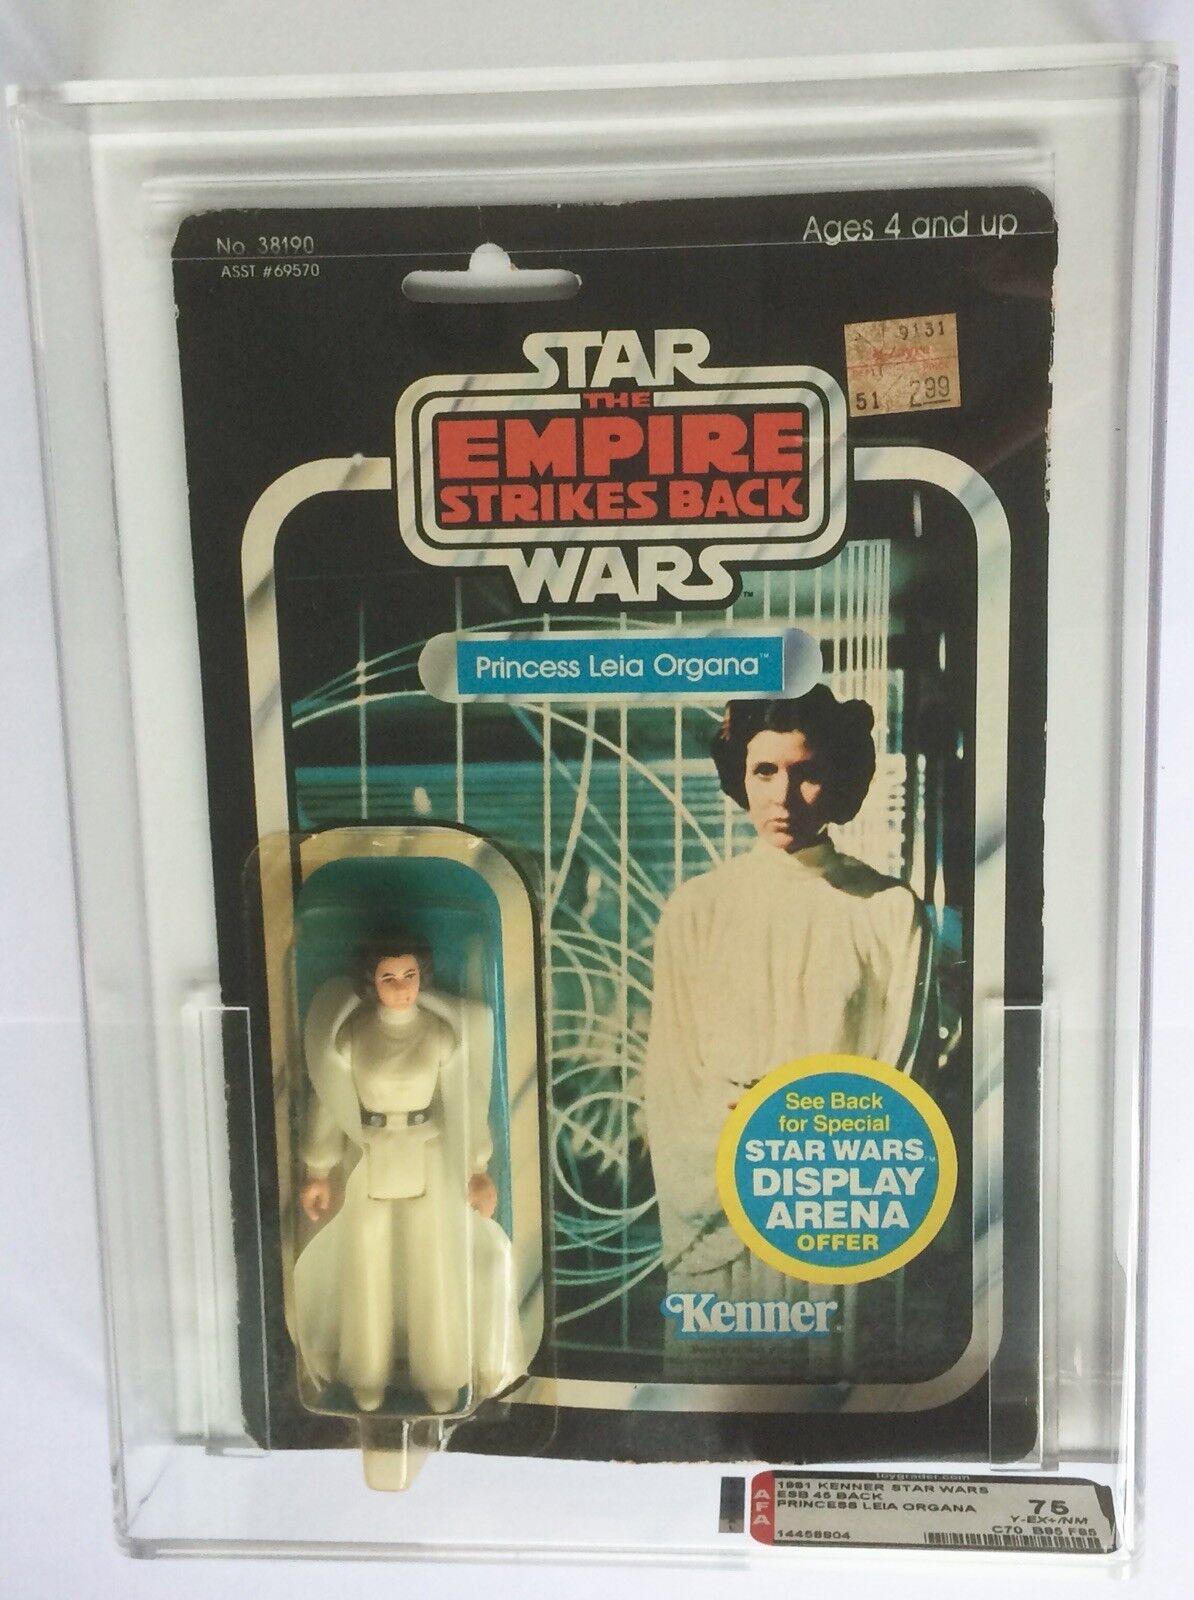 VINTAGE KENNER Star Wars ESB 45 Retro Principessa Leila Organa AFA 75  70/85/85  MOC